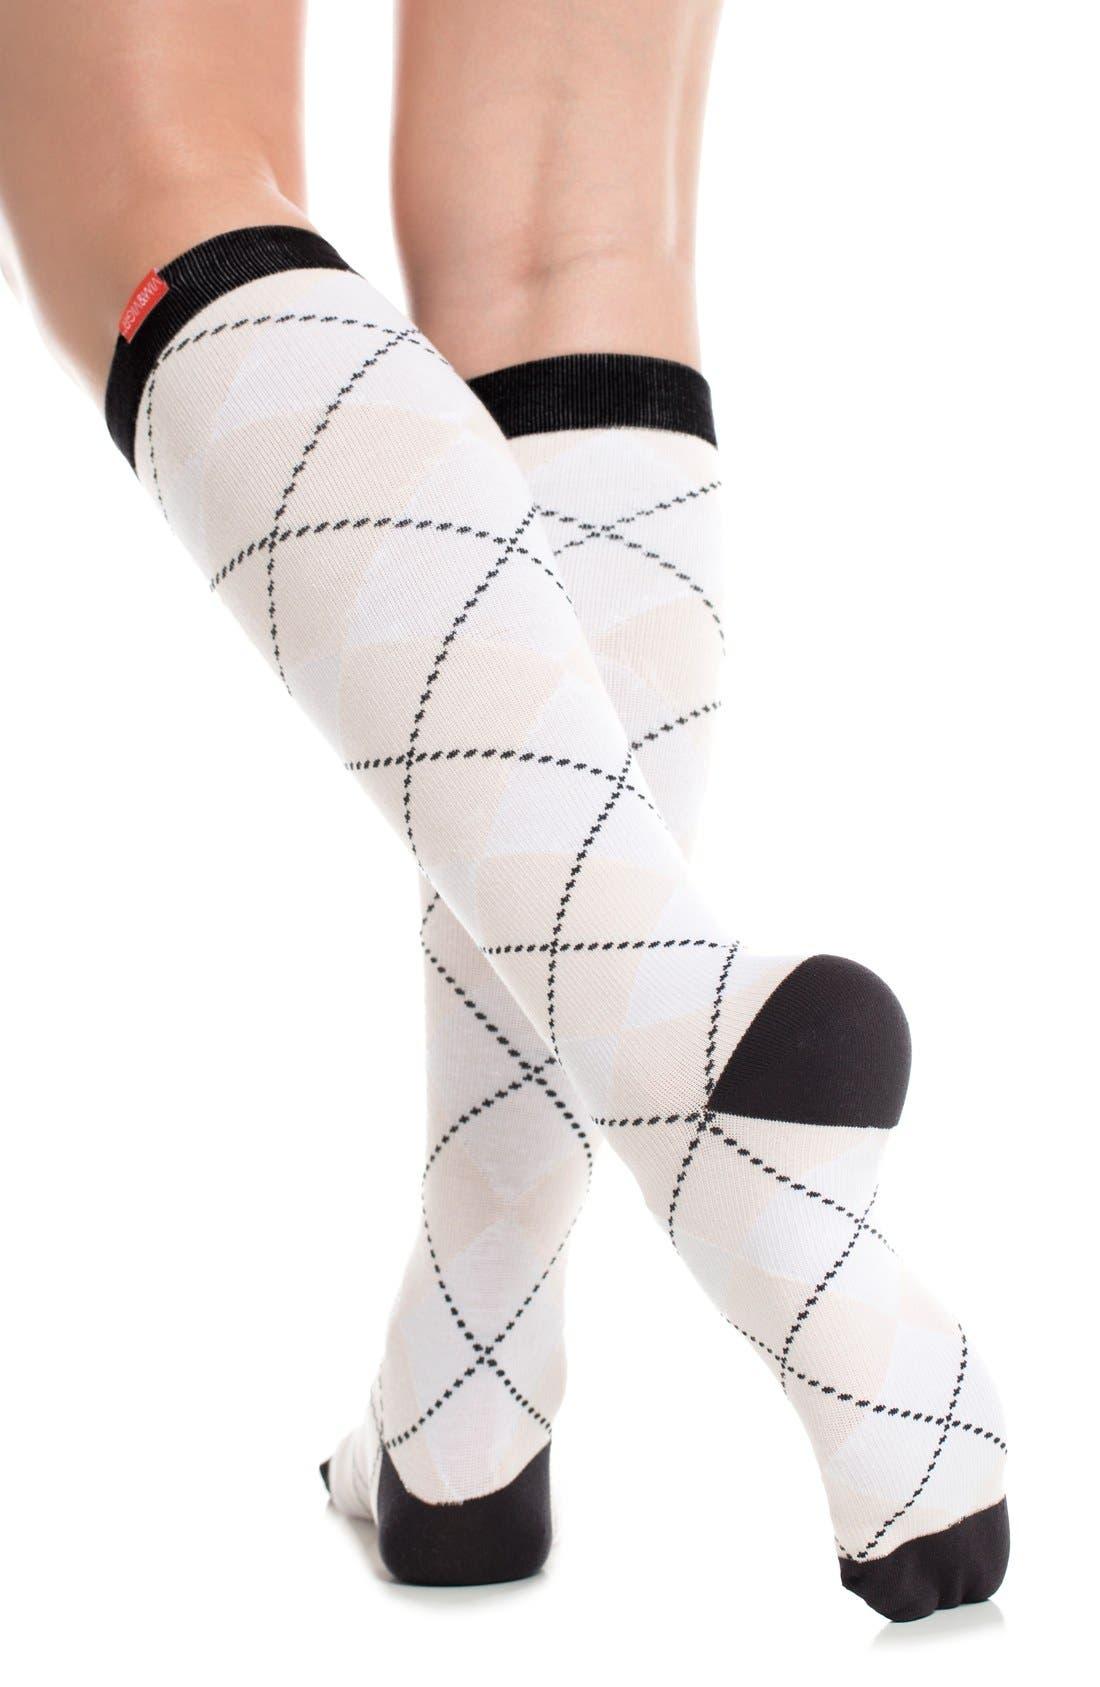 Argyle Graduated Compression Trouser Socks,                             Alternate thumbnail 3, color,                             101